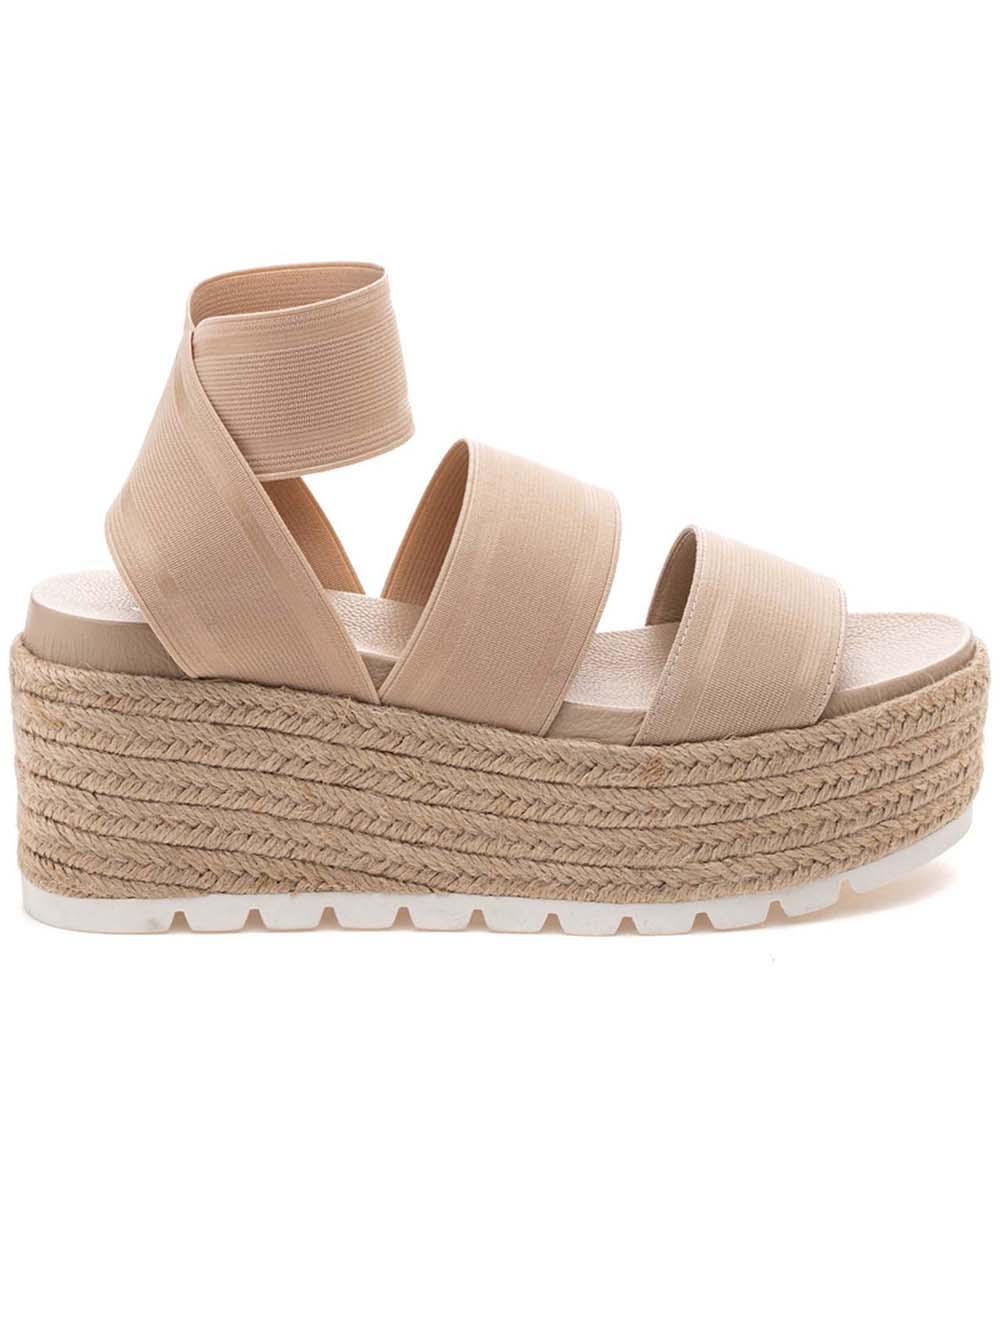 Quartz Platform Strappy Sandal Item # QUARTZ